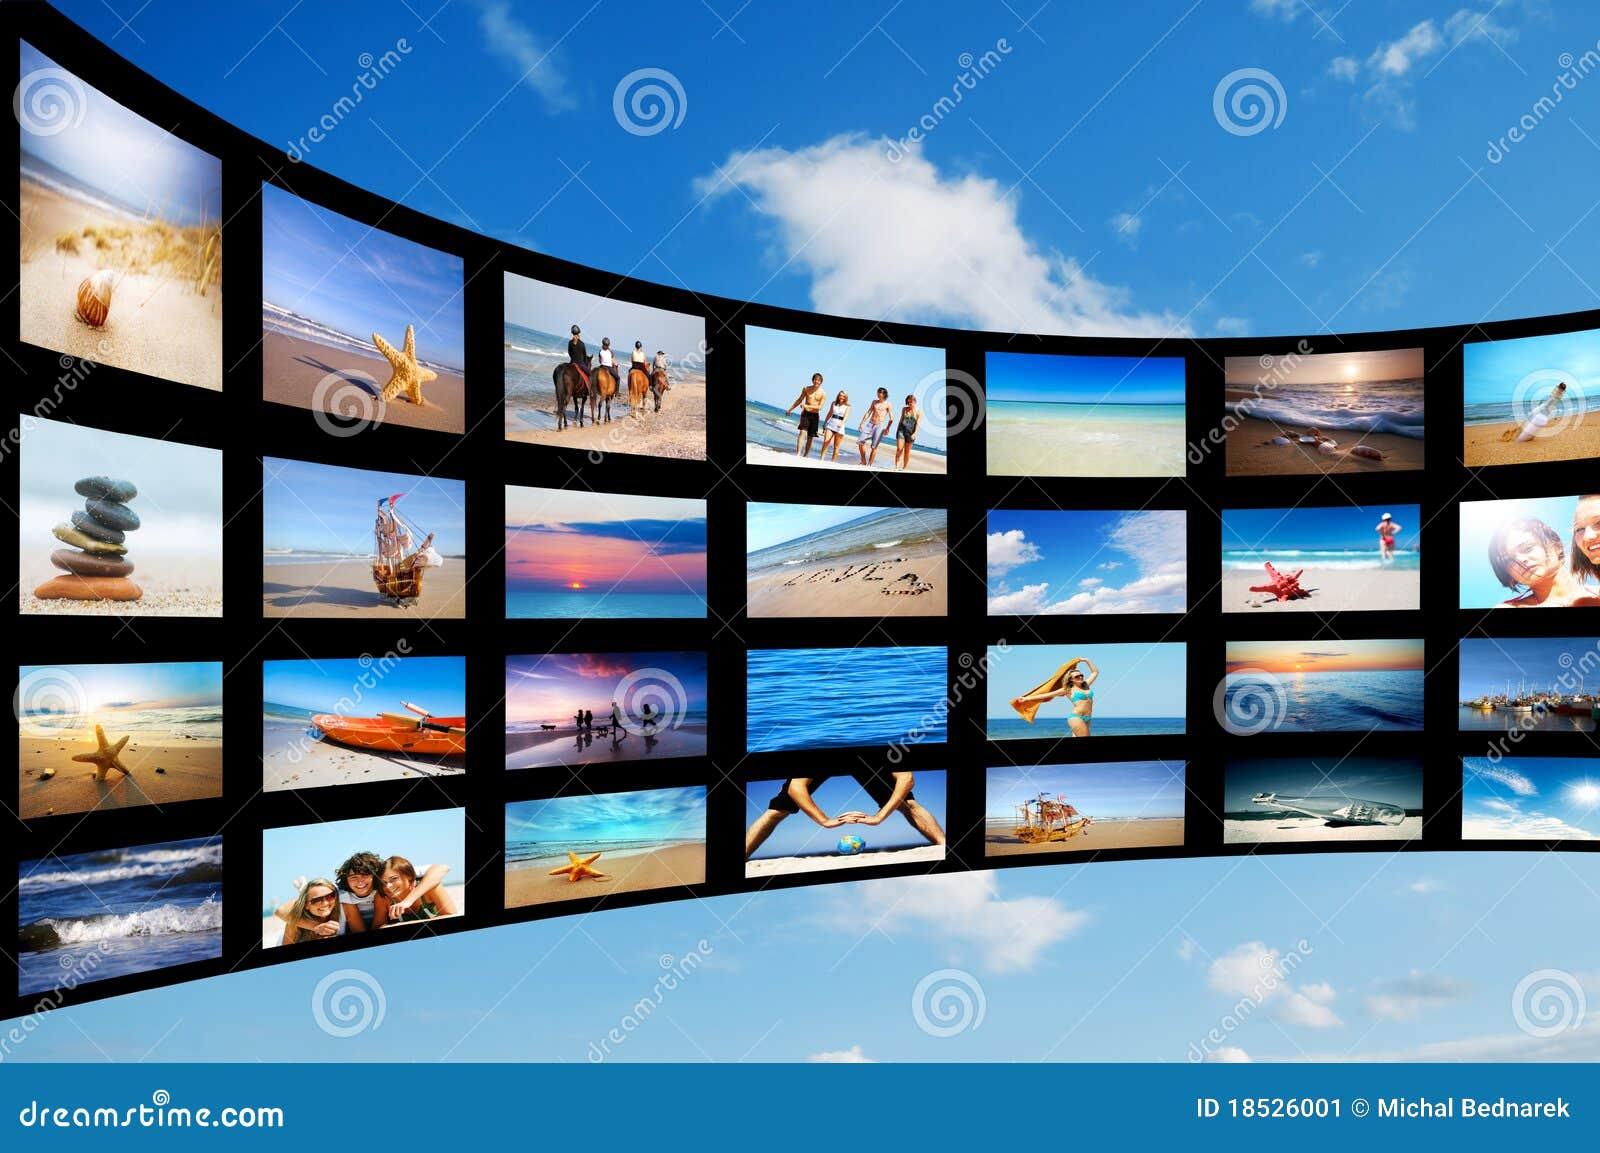 modern tv screens panel stock image  image of high  computer